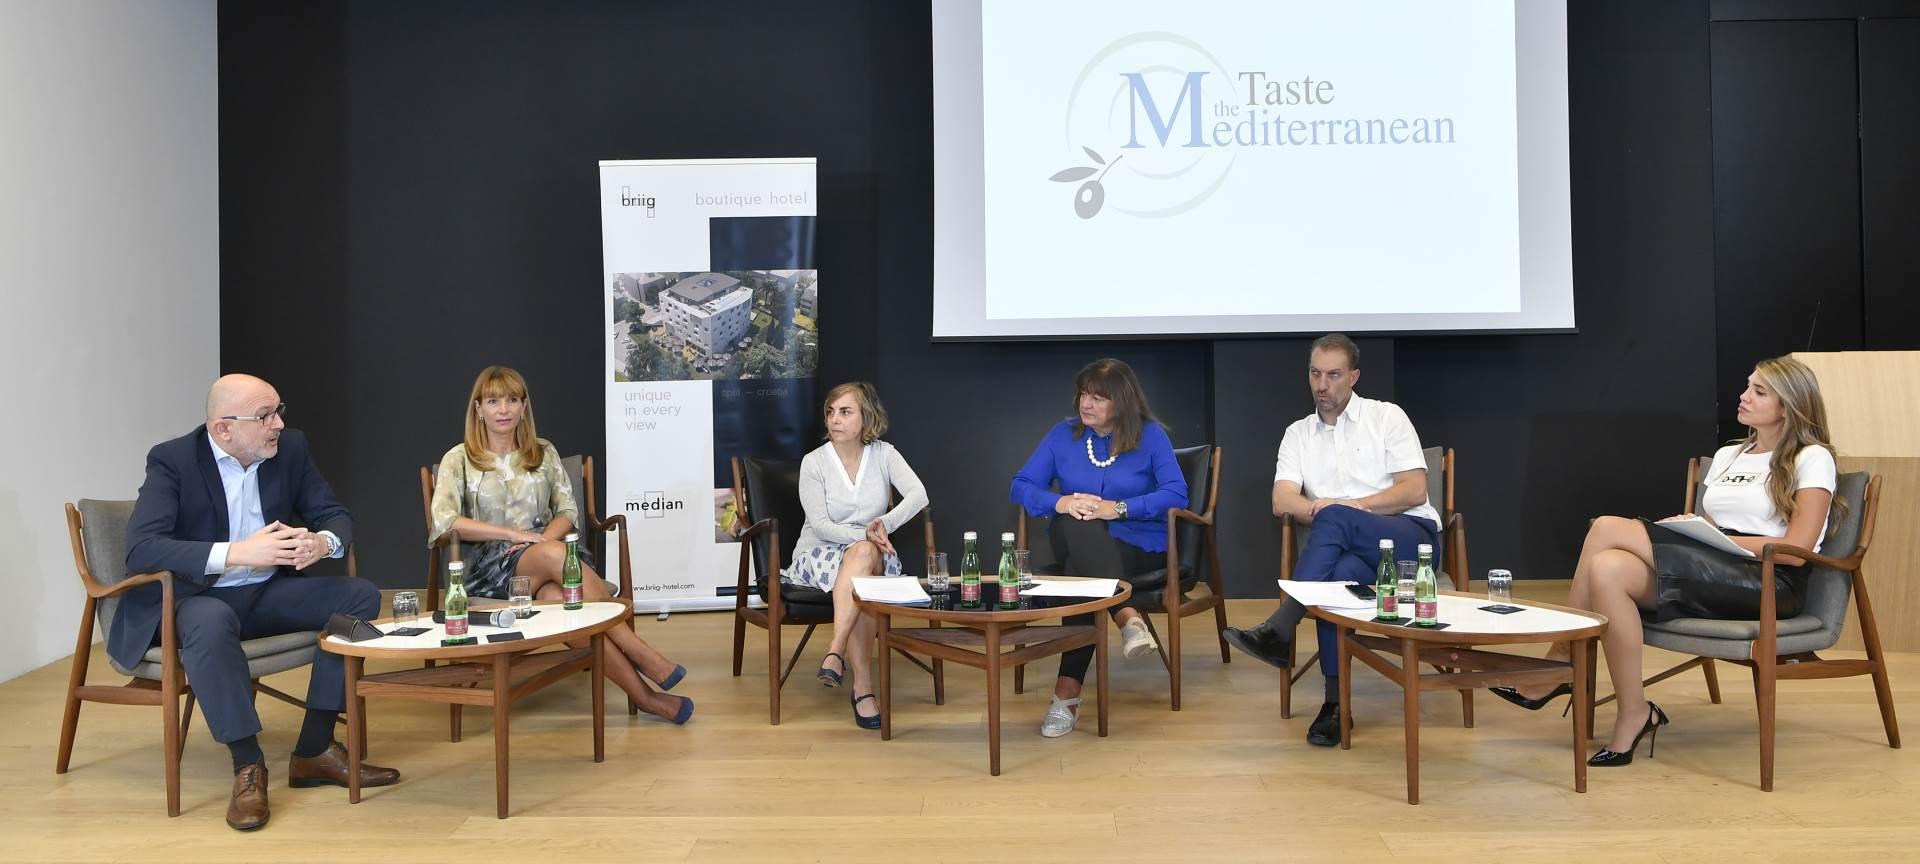 Program festivala predstavili su Dario Mamić, Ana Mazo Martinez, Alijana Vukšić, Ingrid Badurina Danielsson, Joško Stella i voditeljica Mirta Šurjak